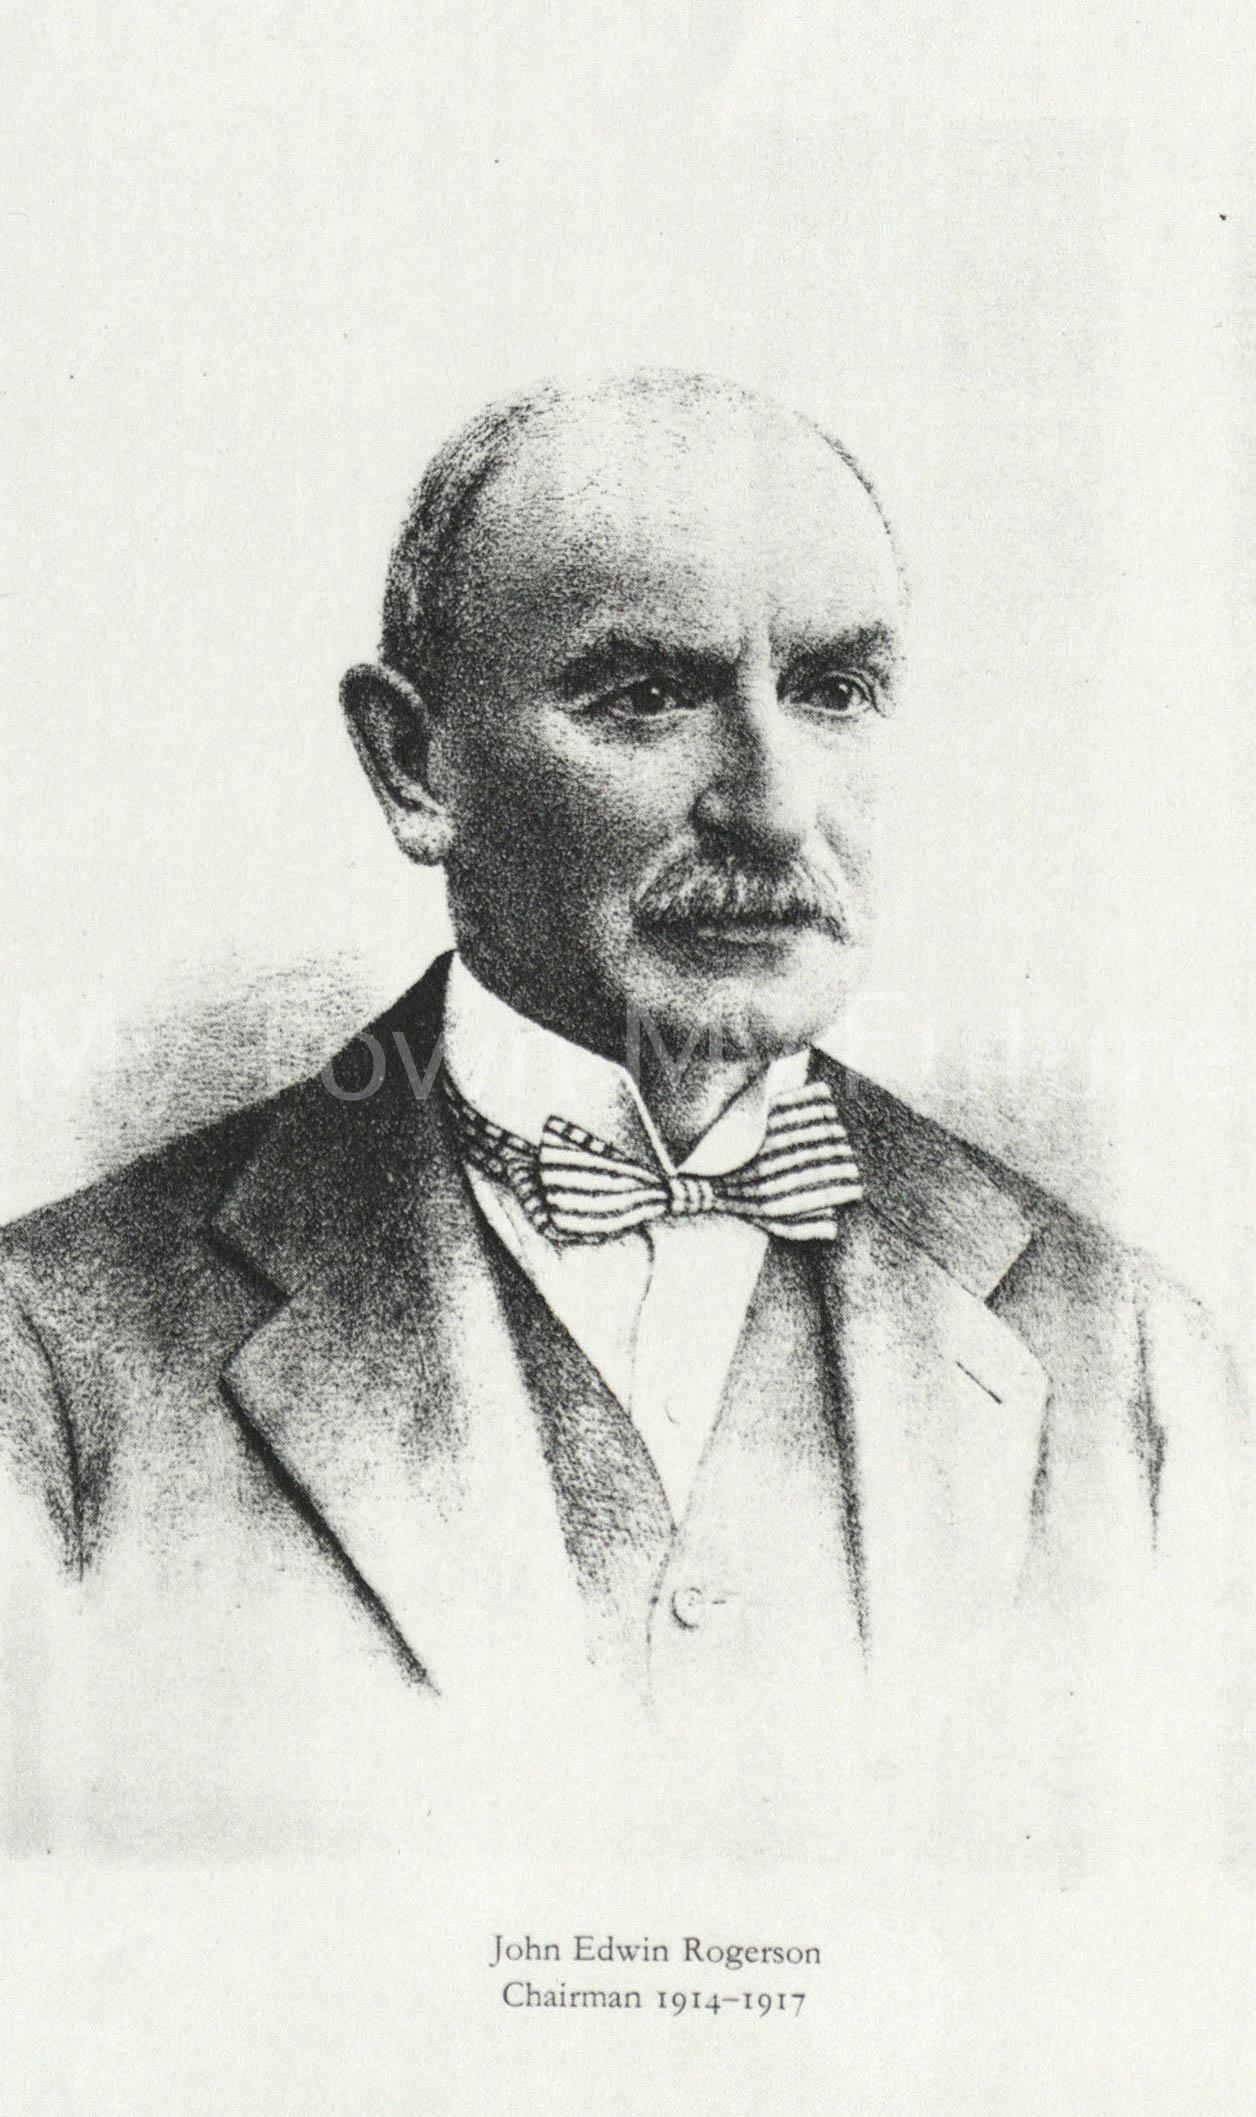 John Edwin Rogerson